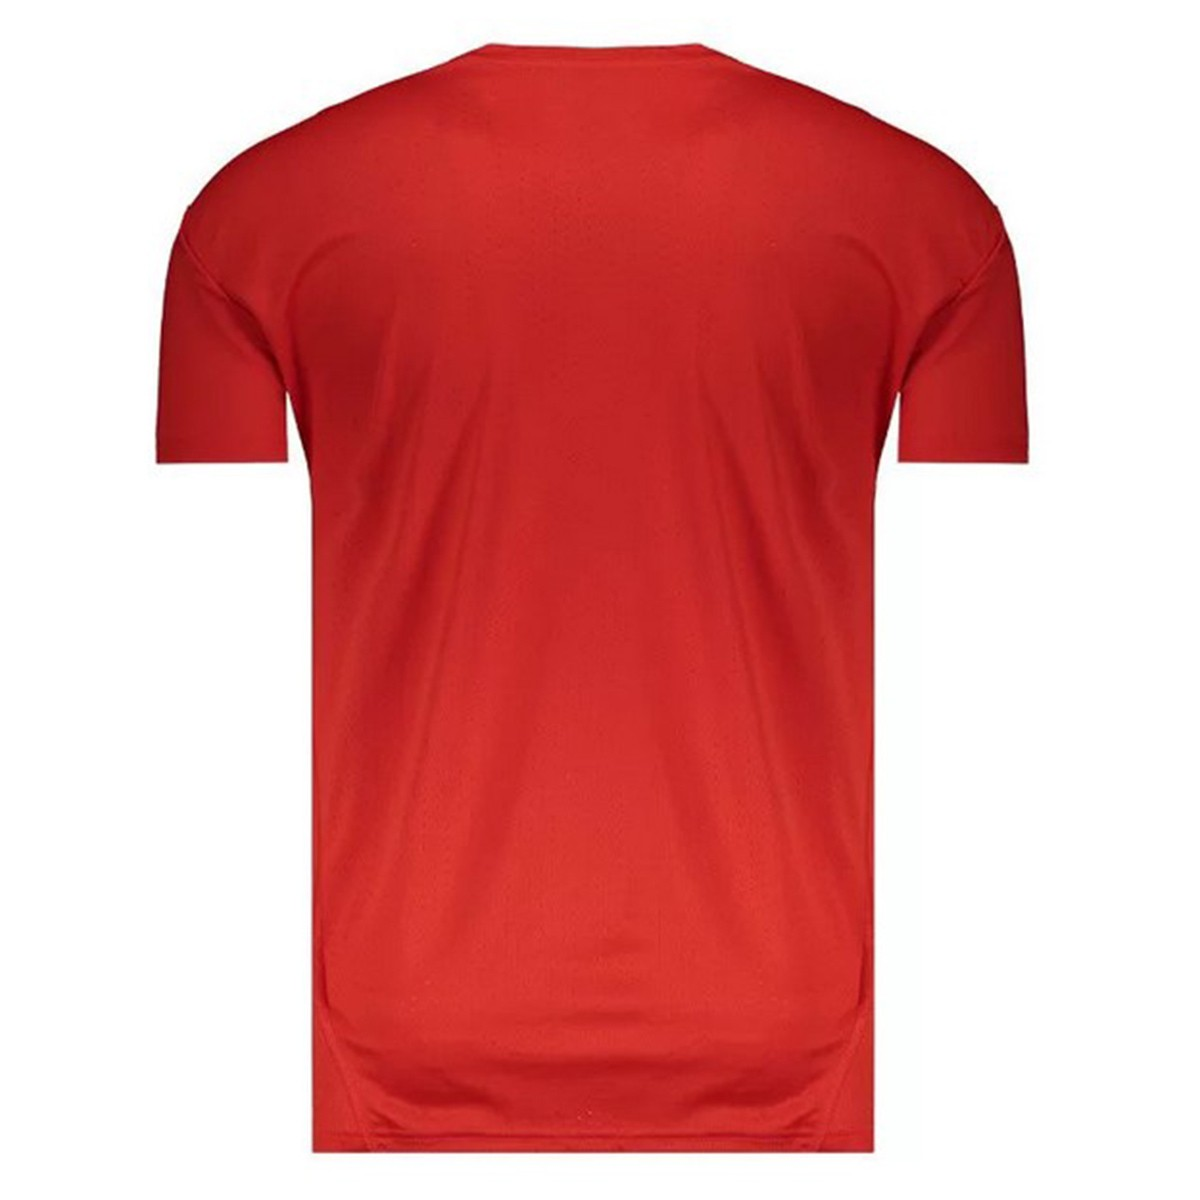 Camiseta Puma A.C.E SS Tee - Vermelha - Drycell - Masculina